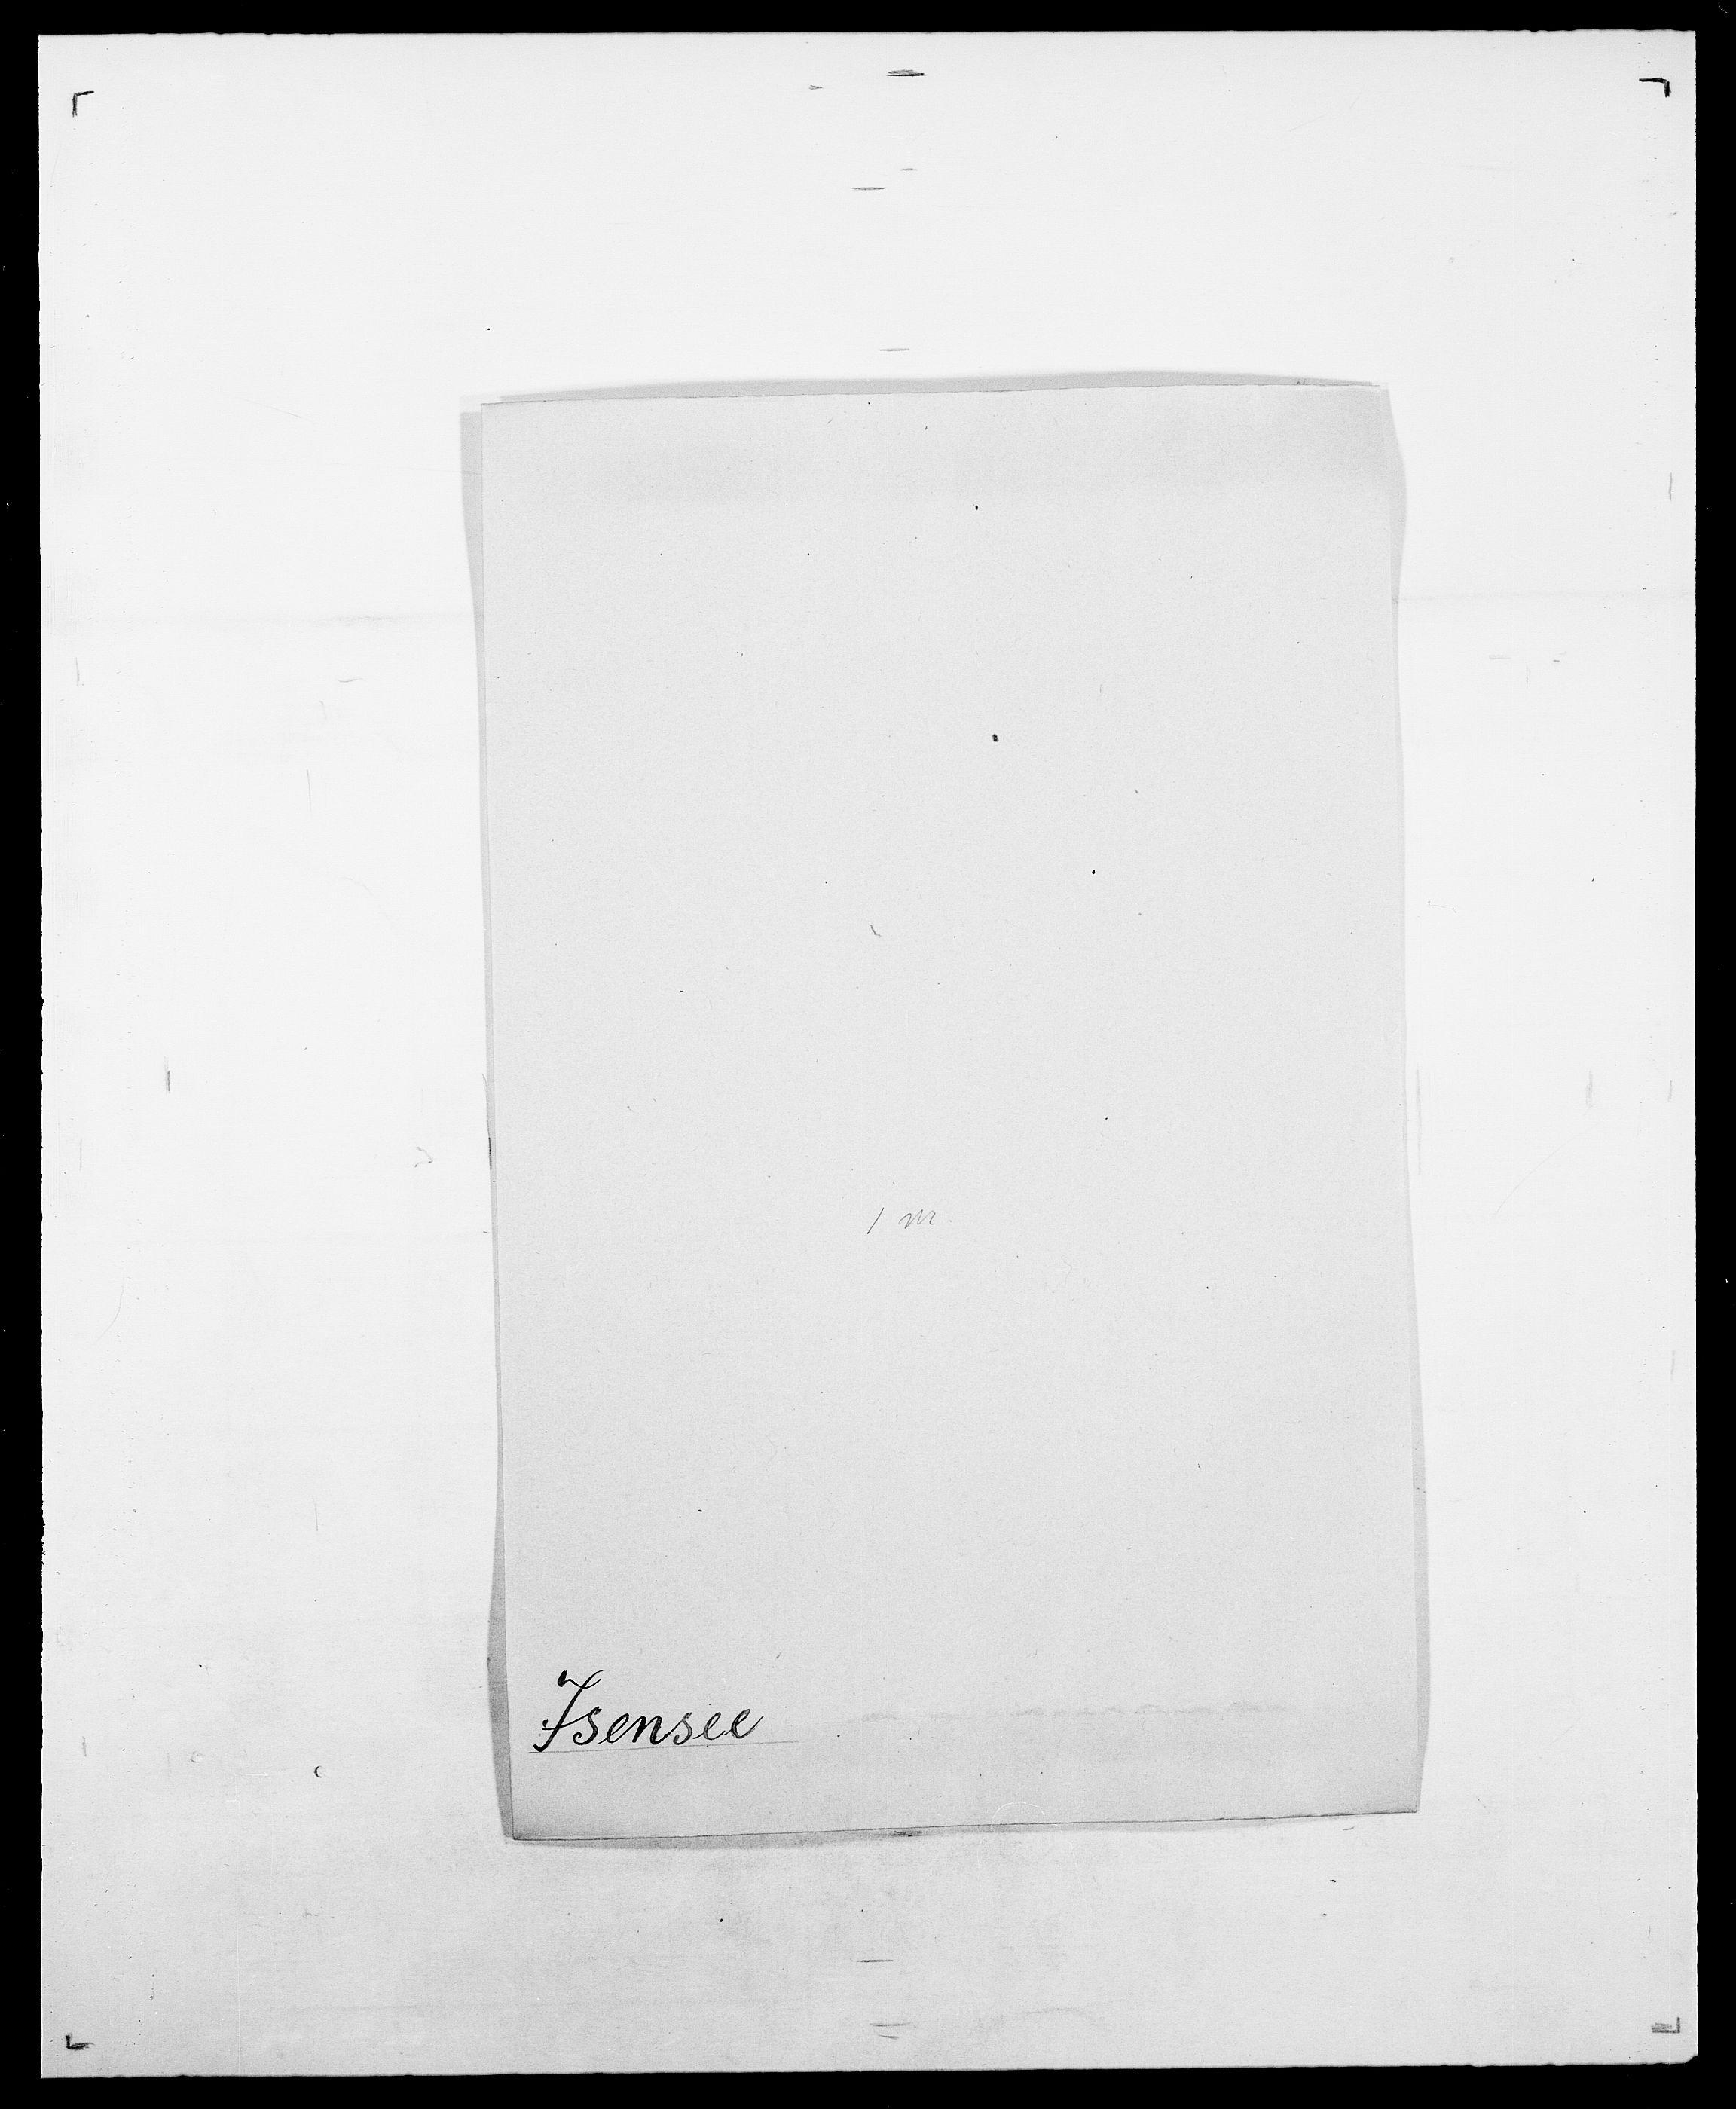 SAO, Delgobe, Charles Antoine - samling, D/Da/L0020: Irgens - Kjøsterud, s. 64